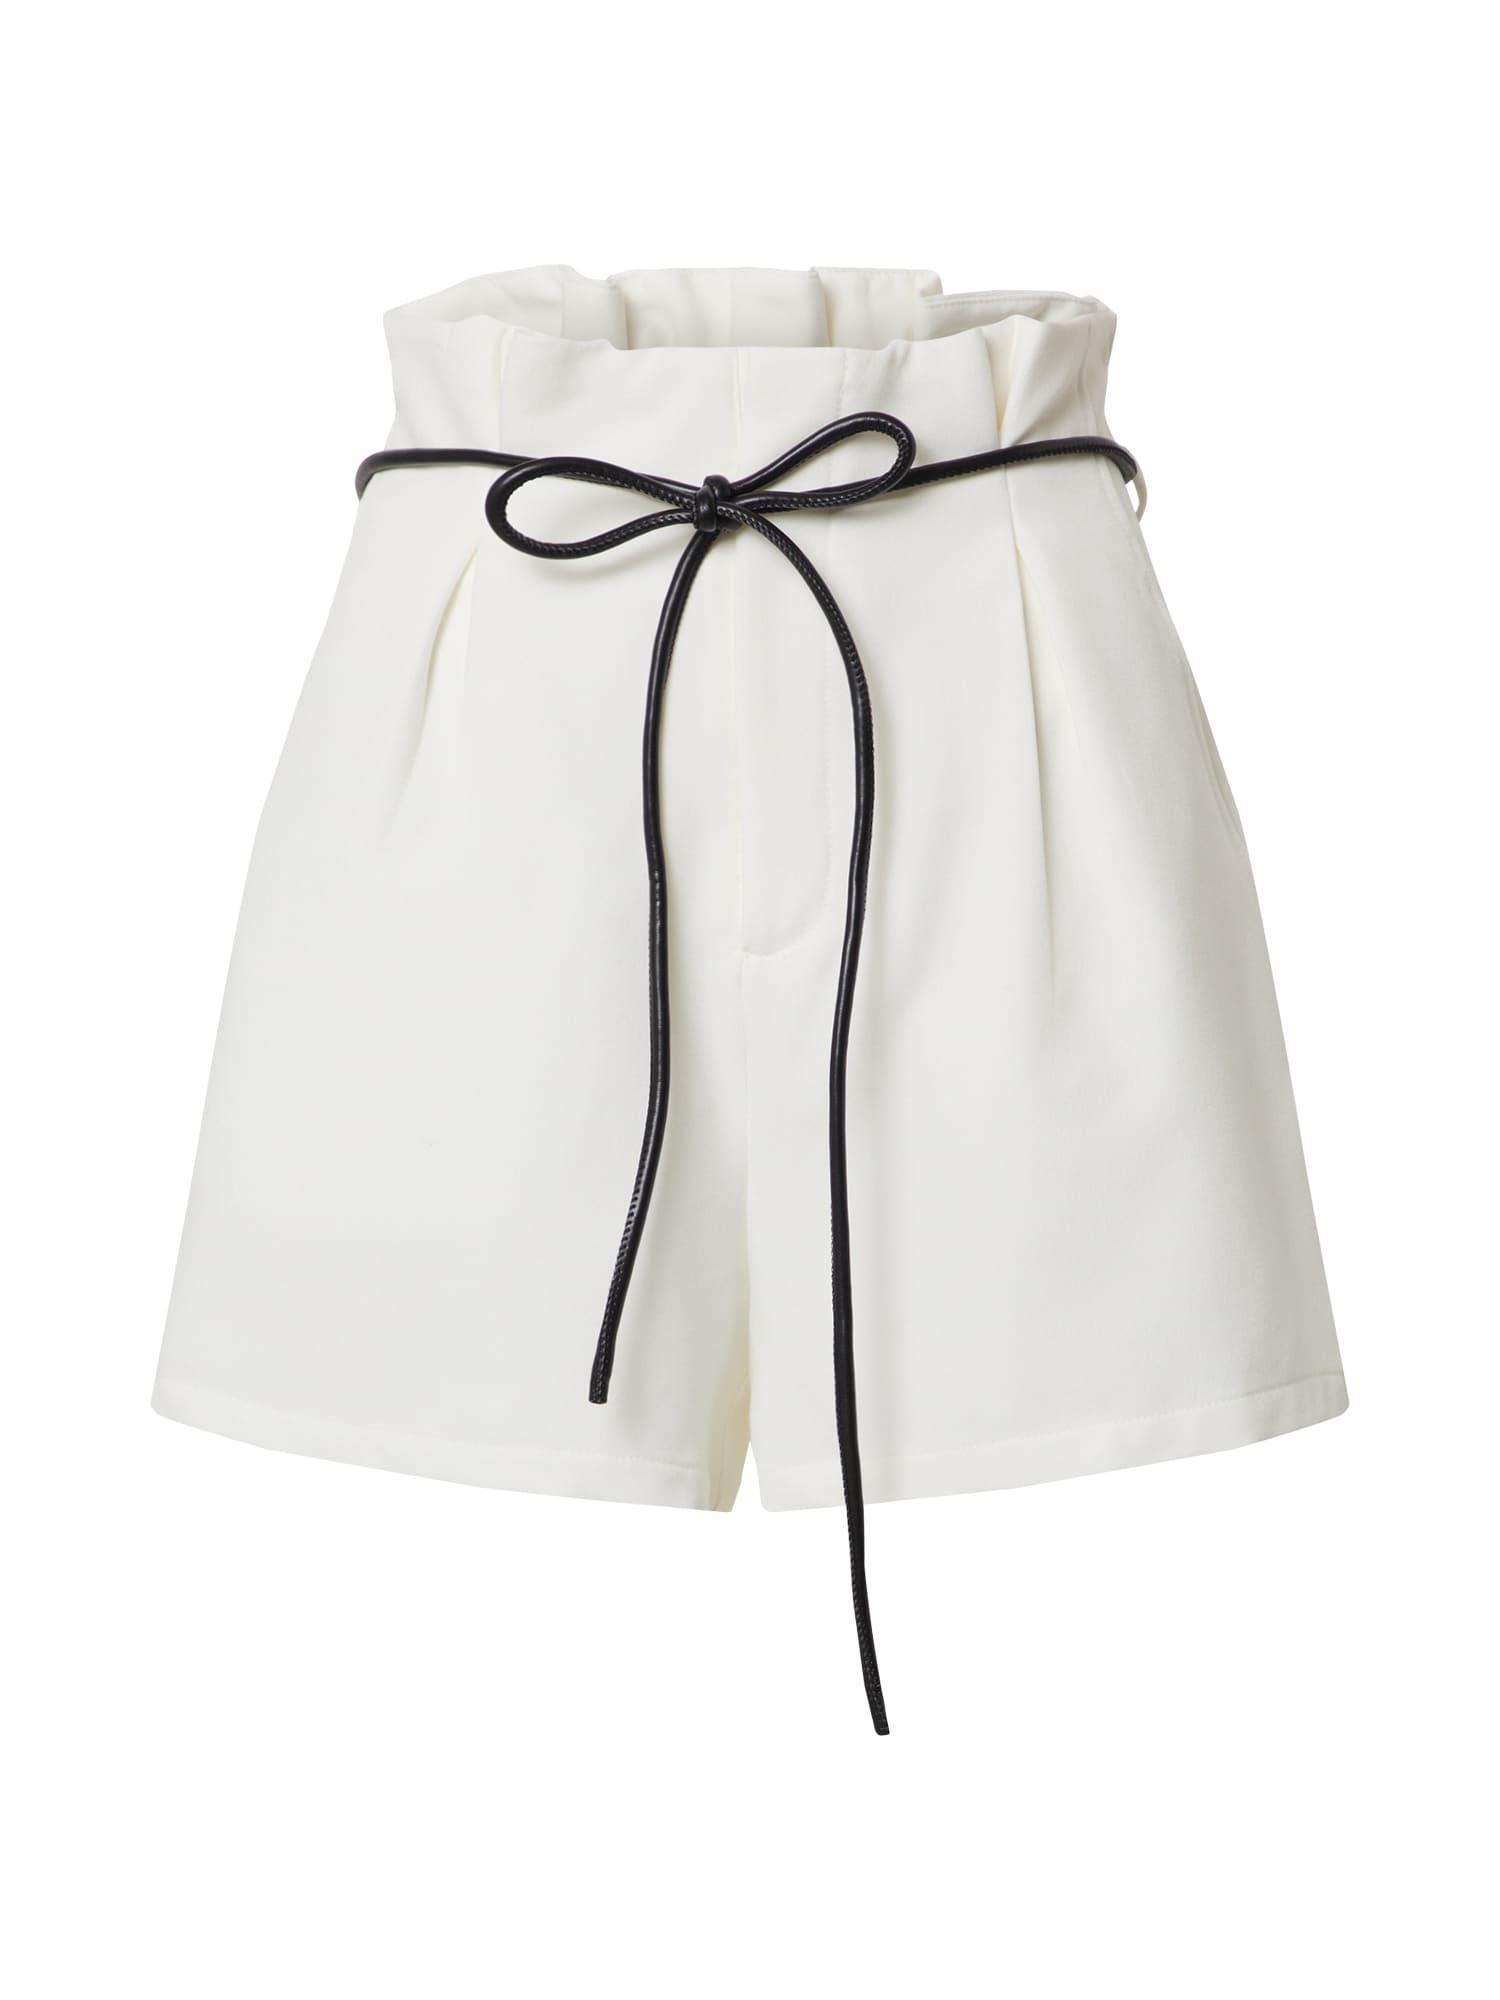 4th & Reckless Klostuotos kelnės 'MOLLIE' balta